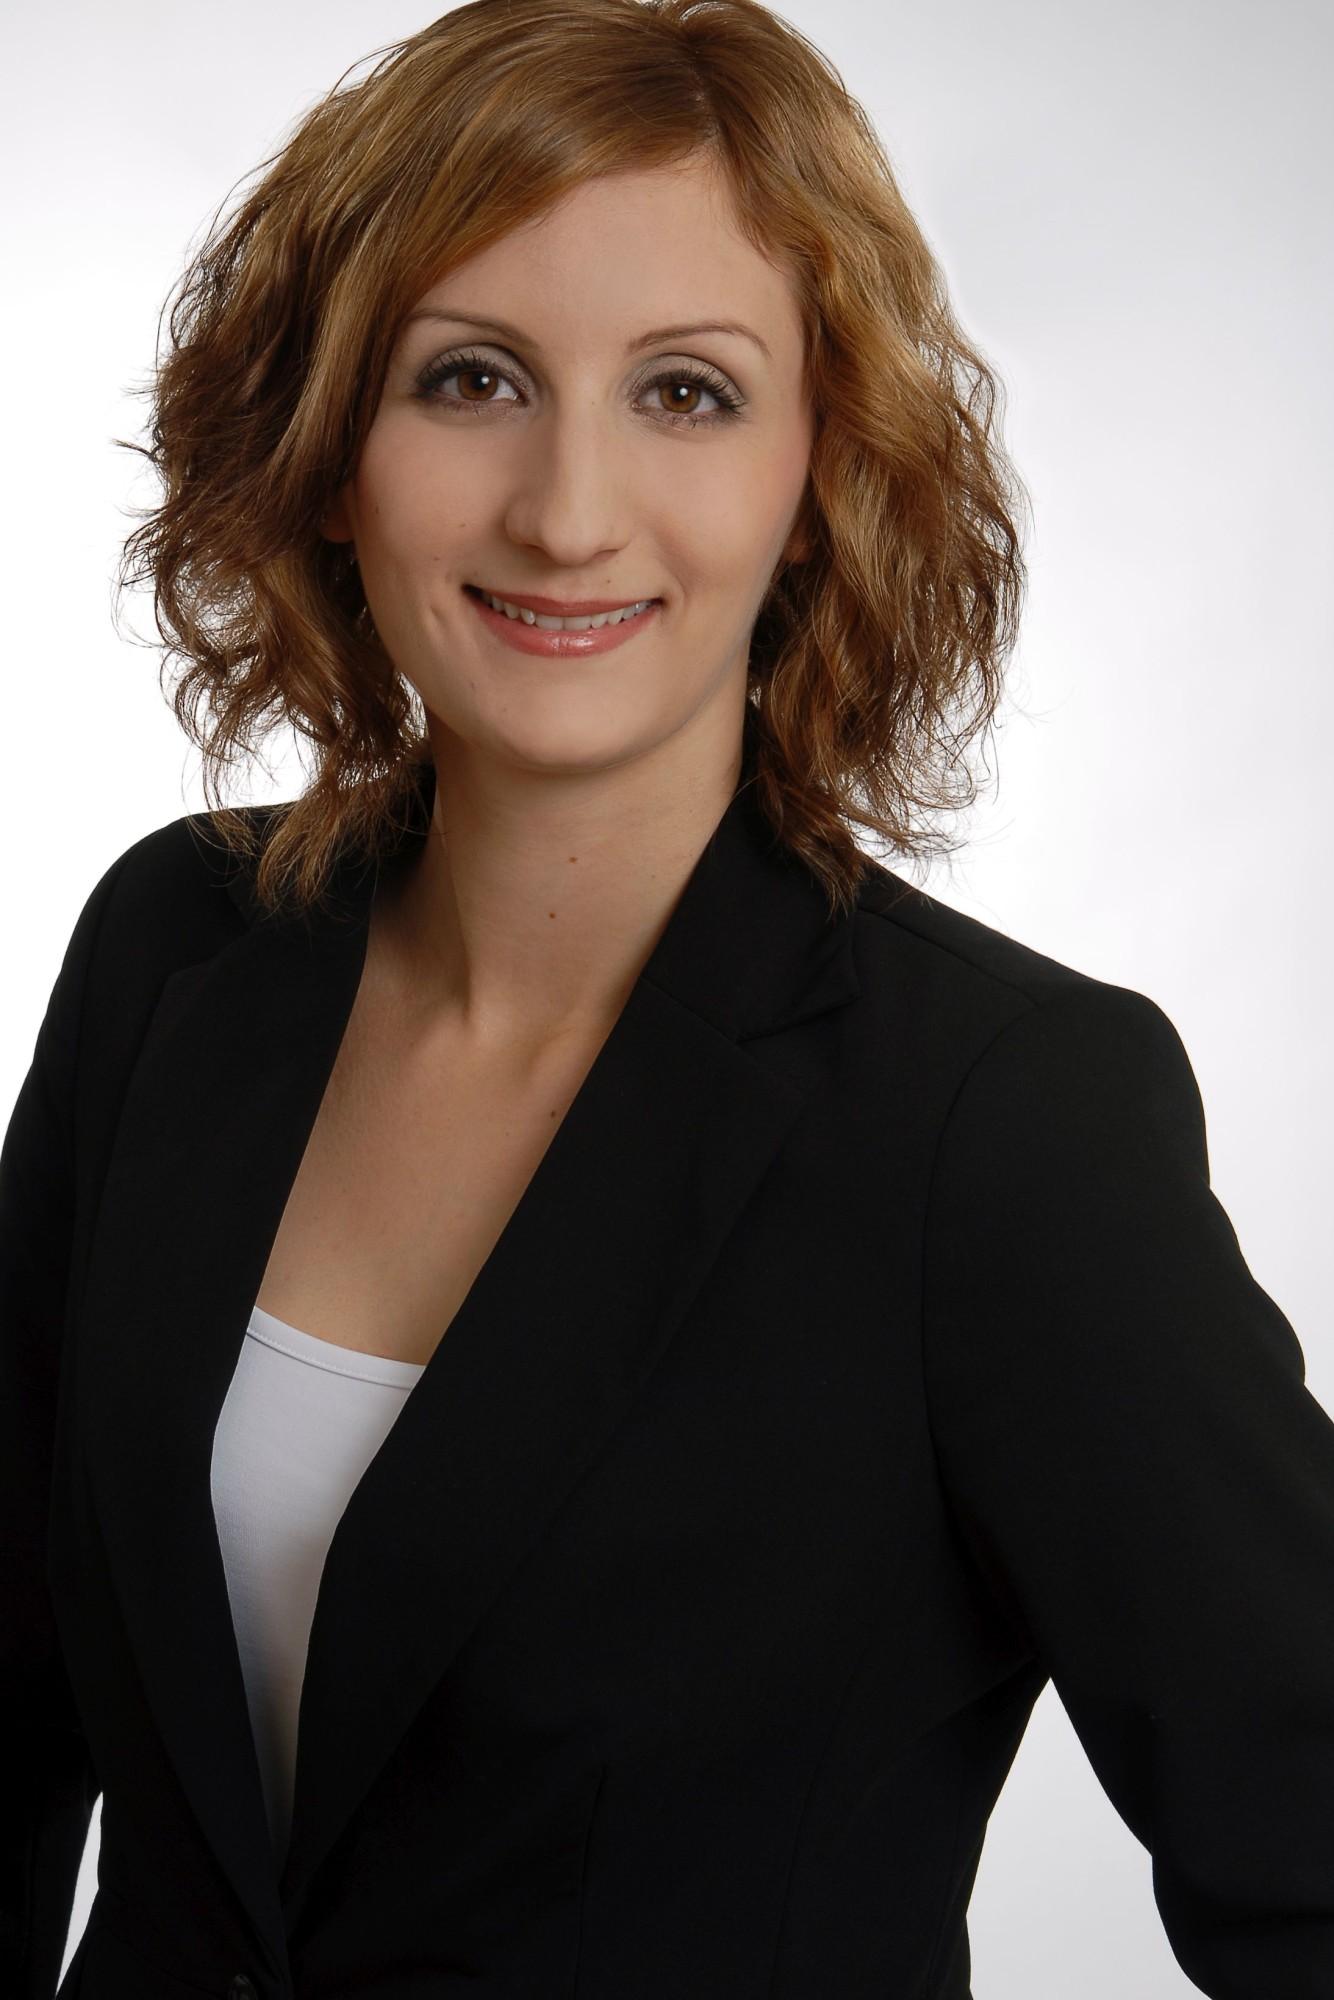 Nina Nowar